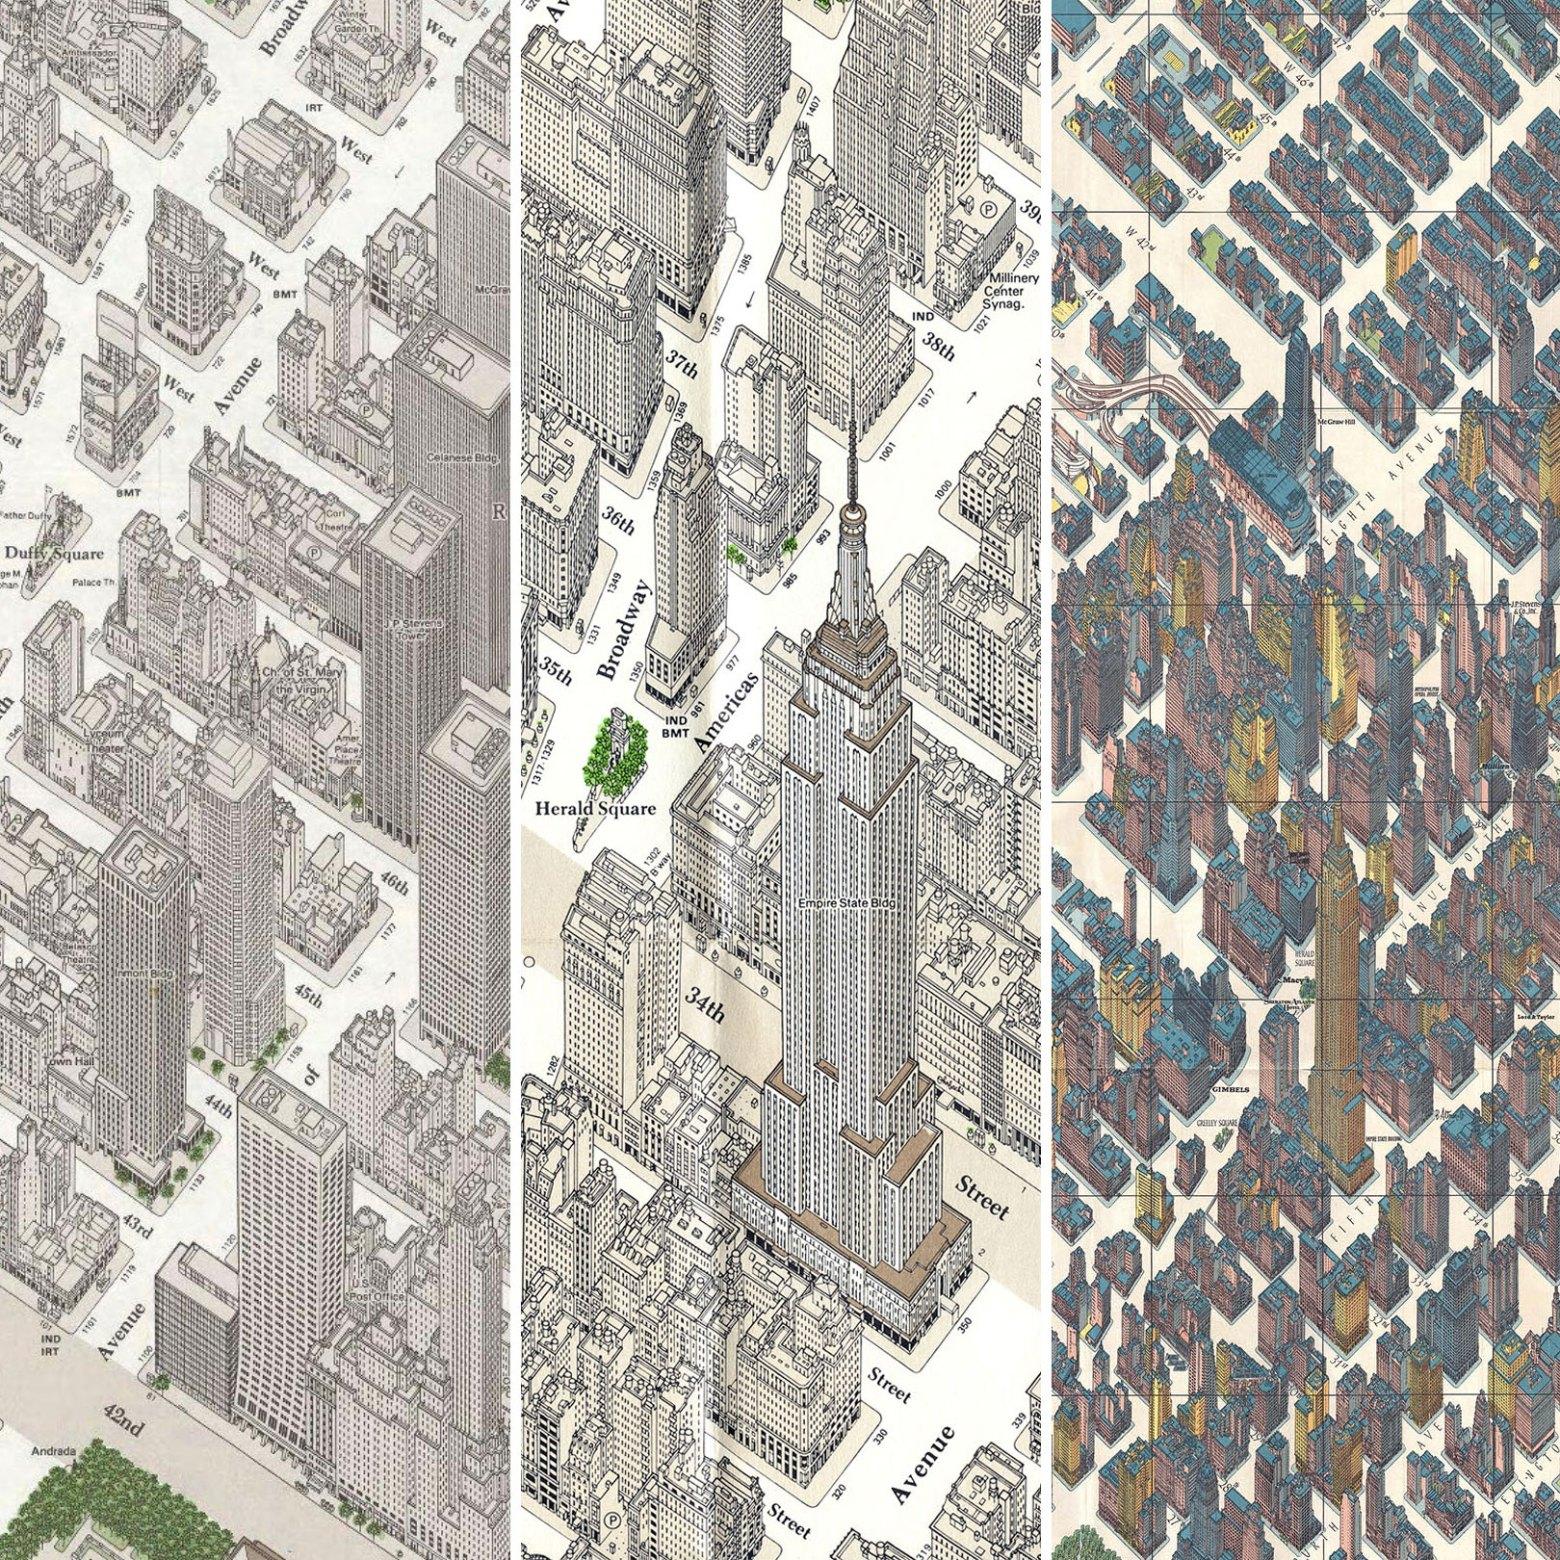 Axonometric views of NYC as inspiration